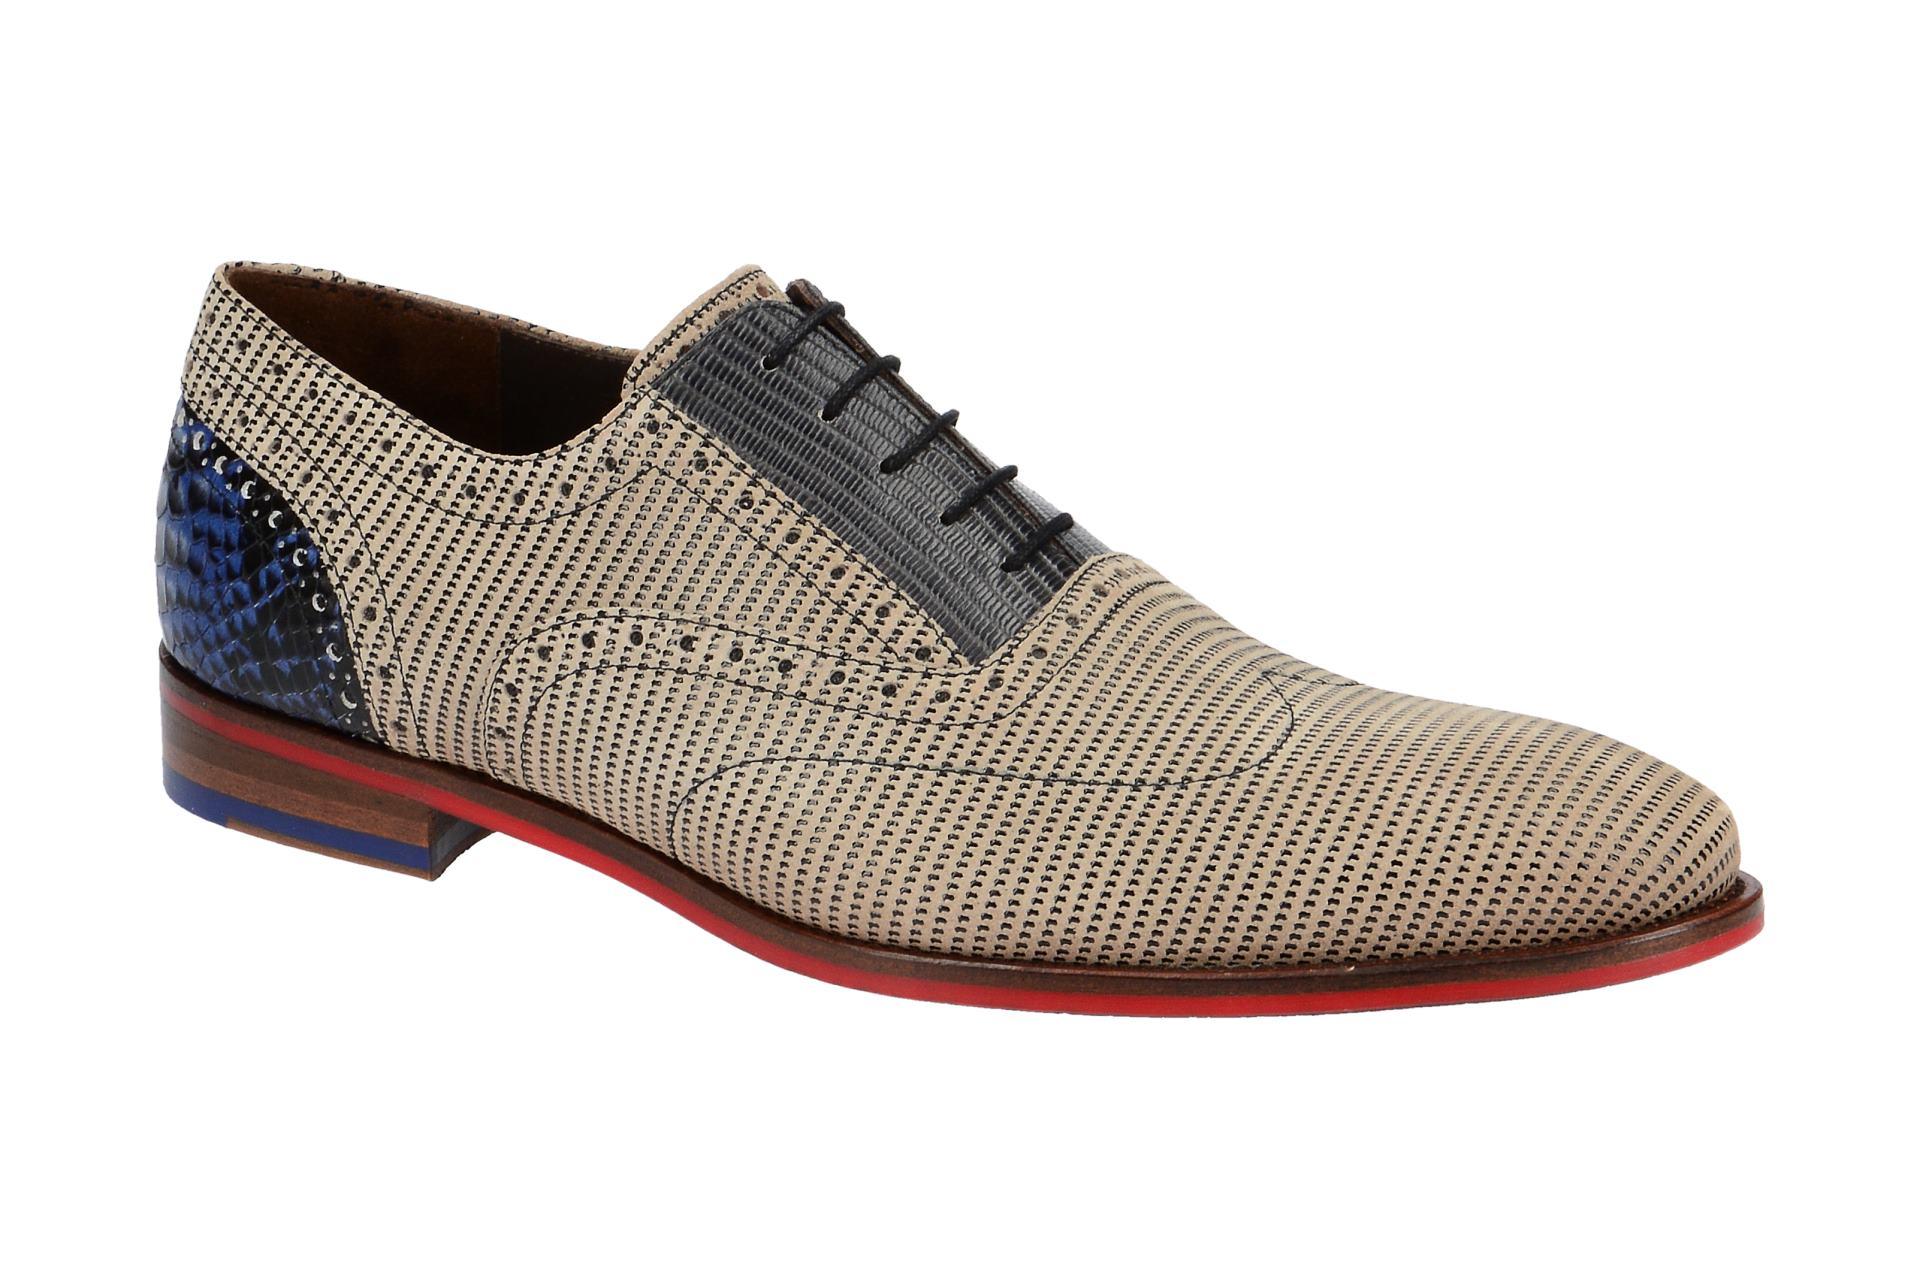 Details zu Floris van Bommel Schuhe 19114 beige Herrenschuhe elegante Halbschuhe 1911406